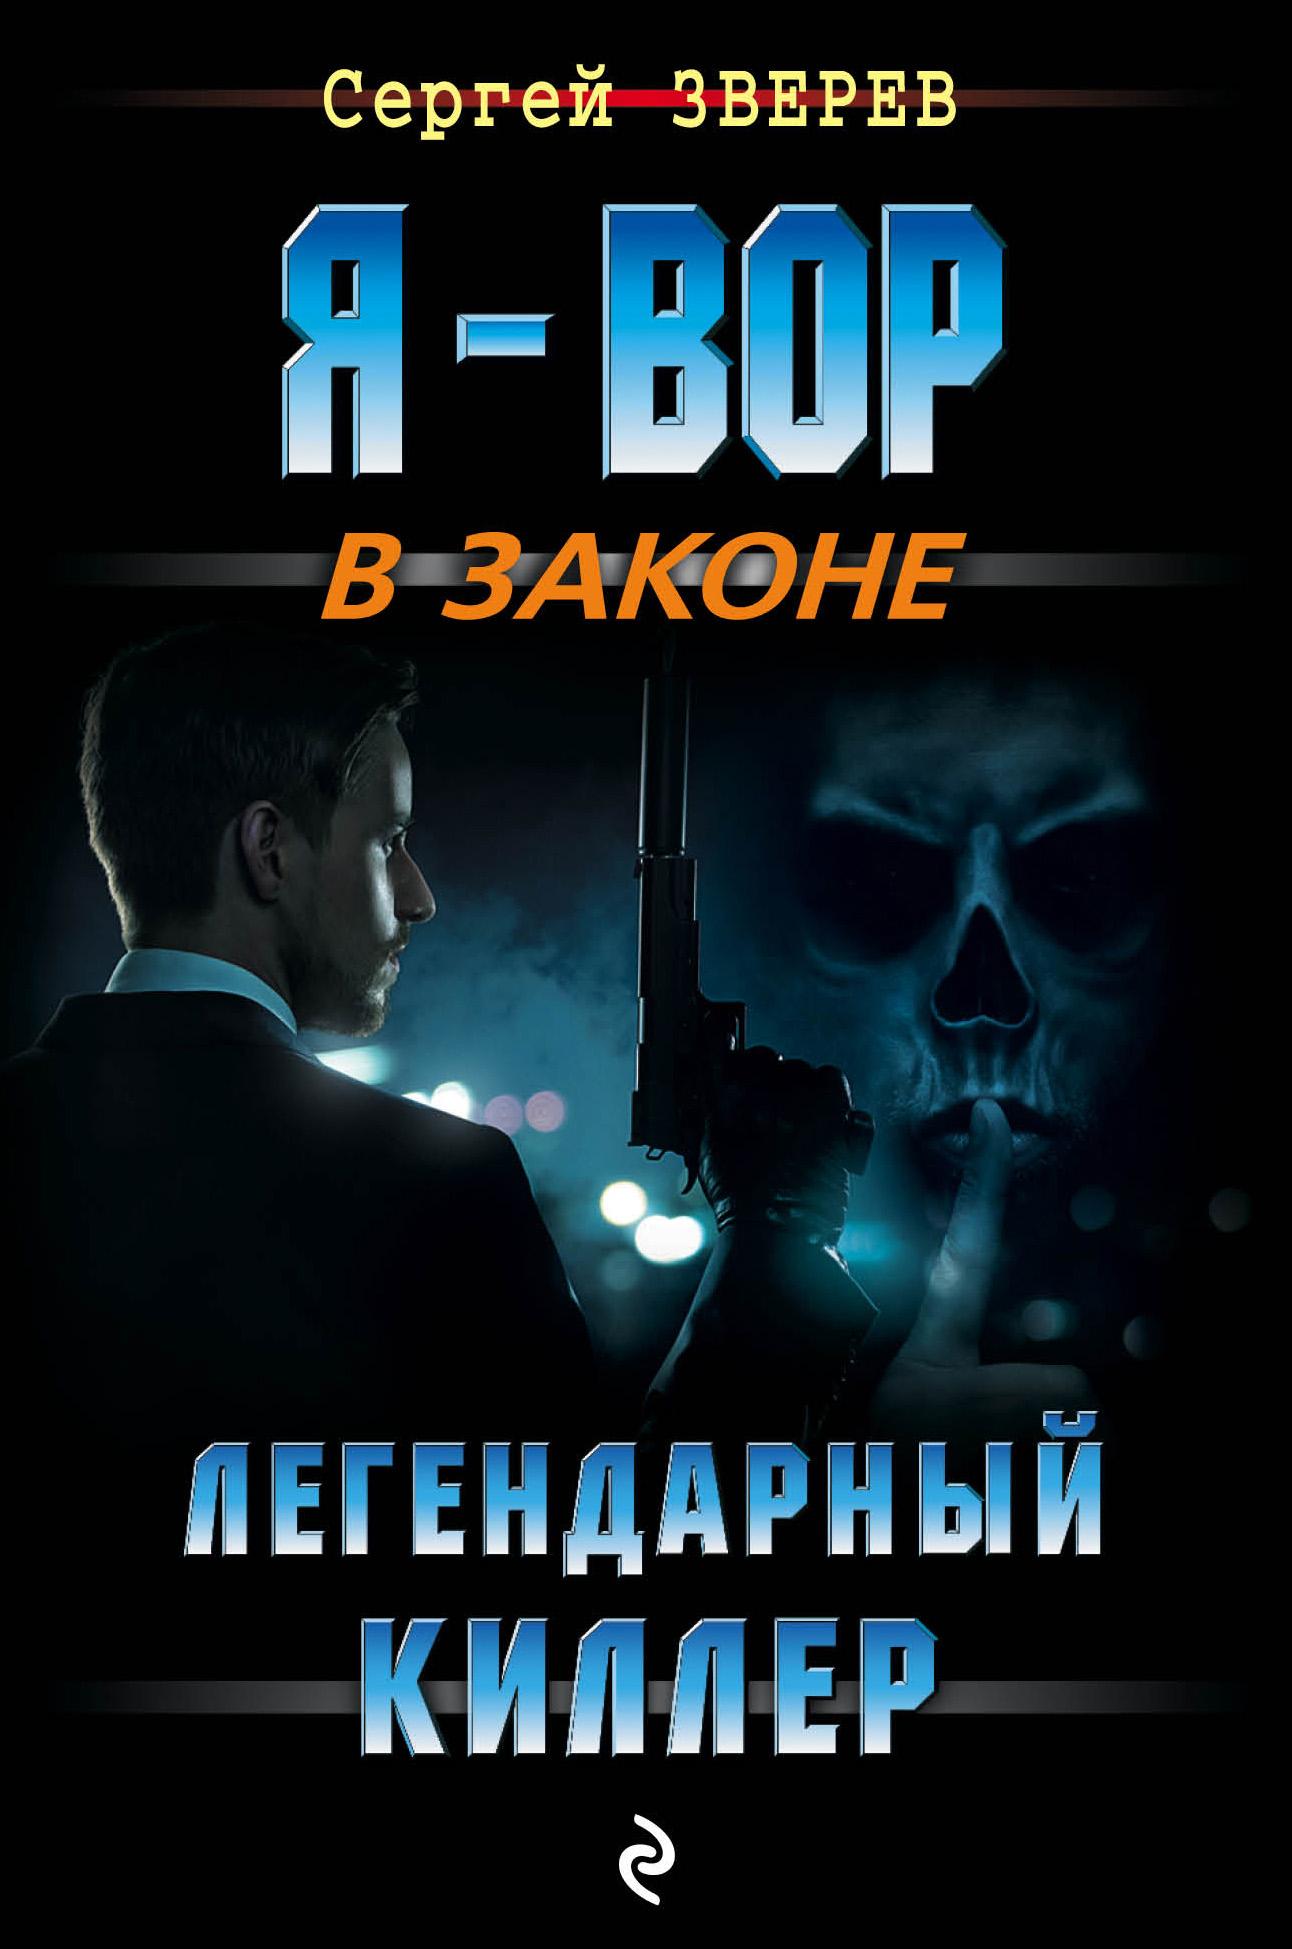 Сергей Зверев Легендарный киллер автохимия зеленка